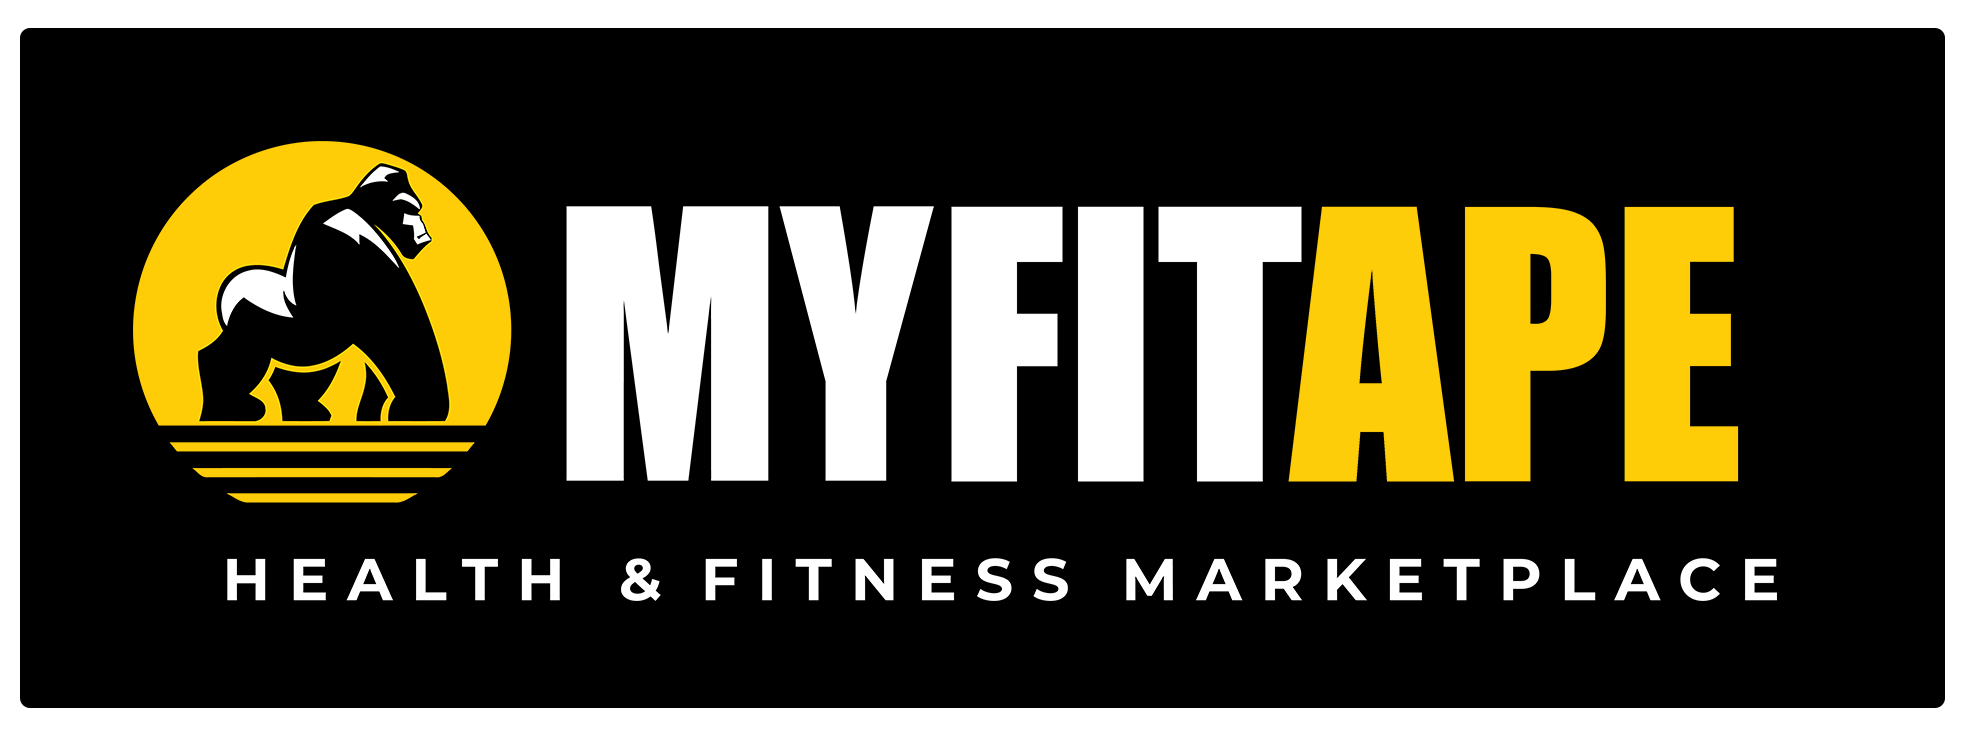 MYFITAPE Logo